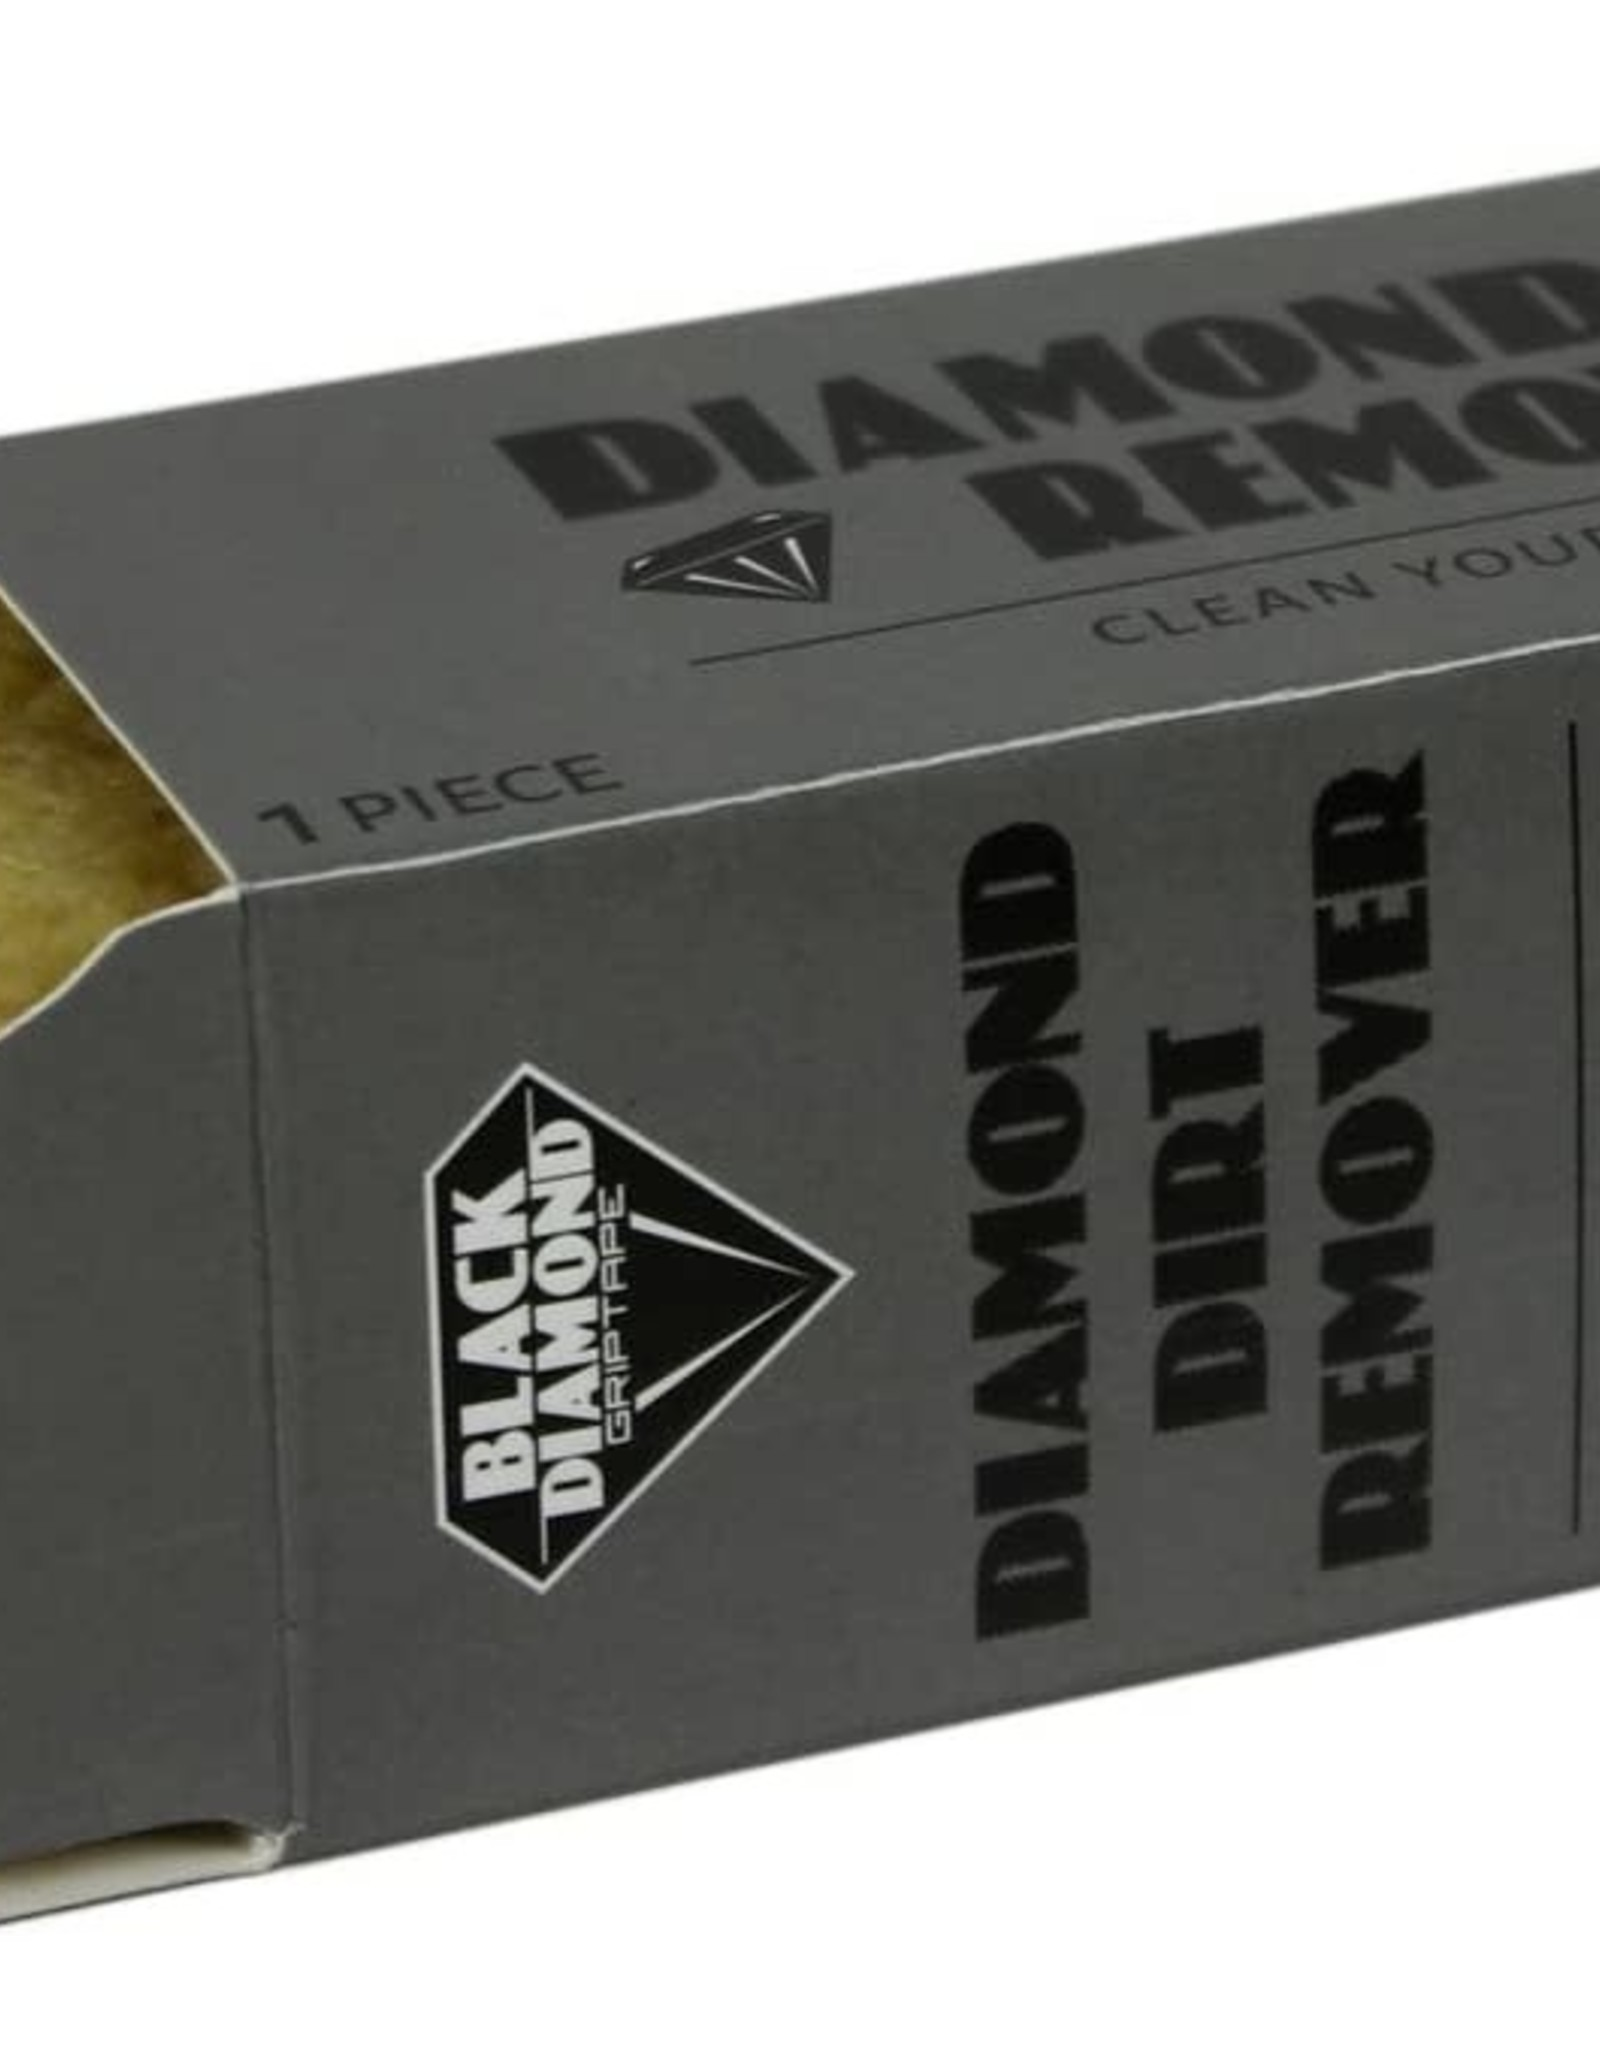 BLACK DIAMOND BLACK DIAMOND GRIPTAPE DIRT REMOVER CLEANER